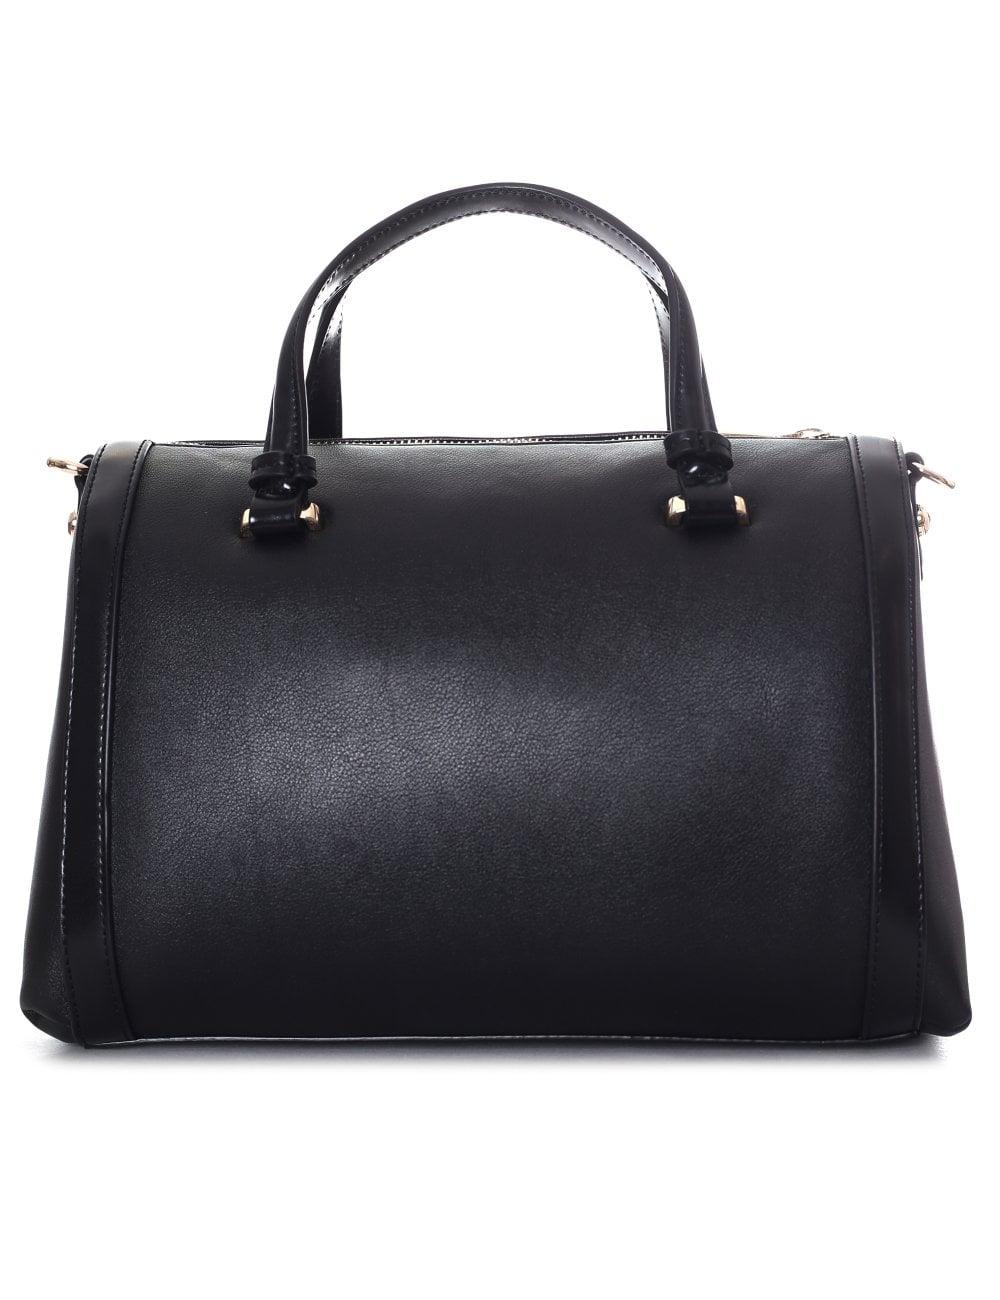 de6fb8bf3bedd Versace Jeans Women s Large Stud Bowler Bag Black